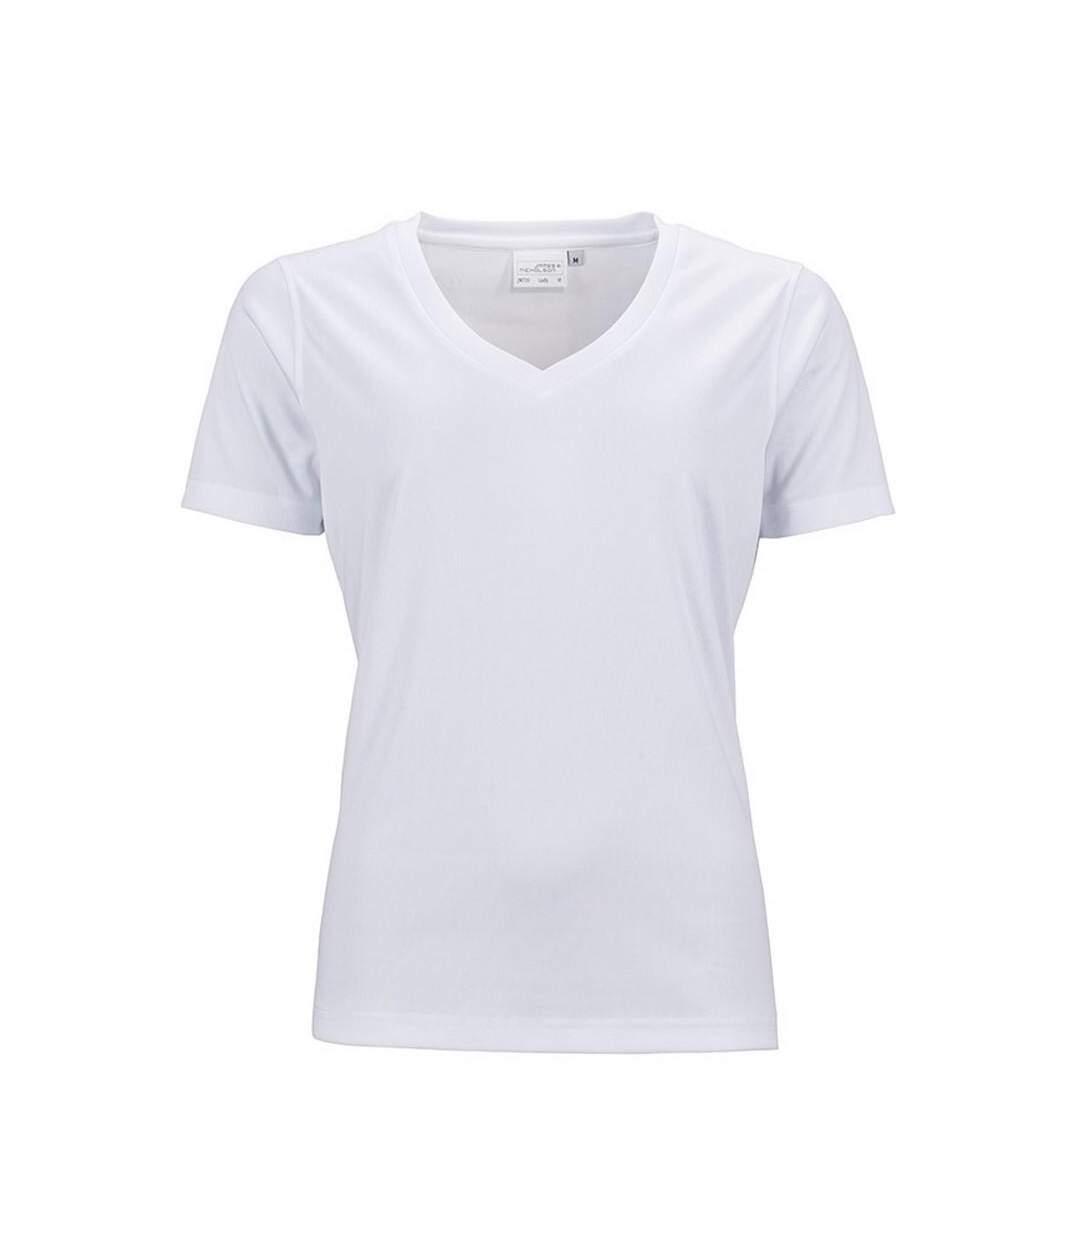 James And Nicholson - T-Shirt Col En V - Femme (Blanc) - UTFU221